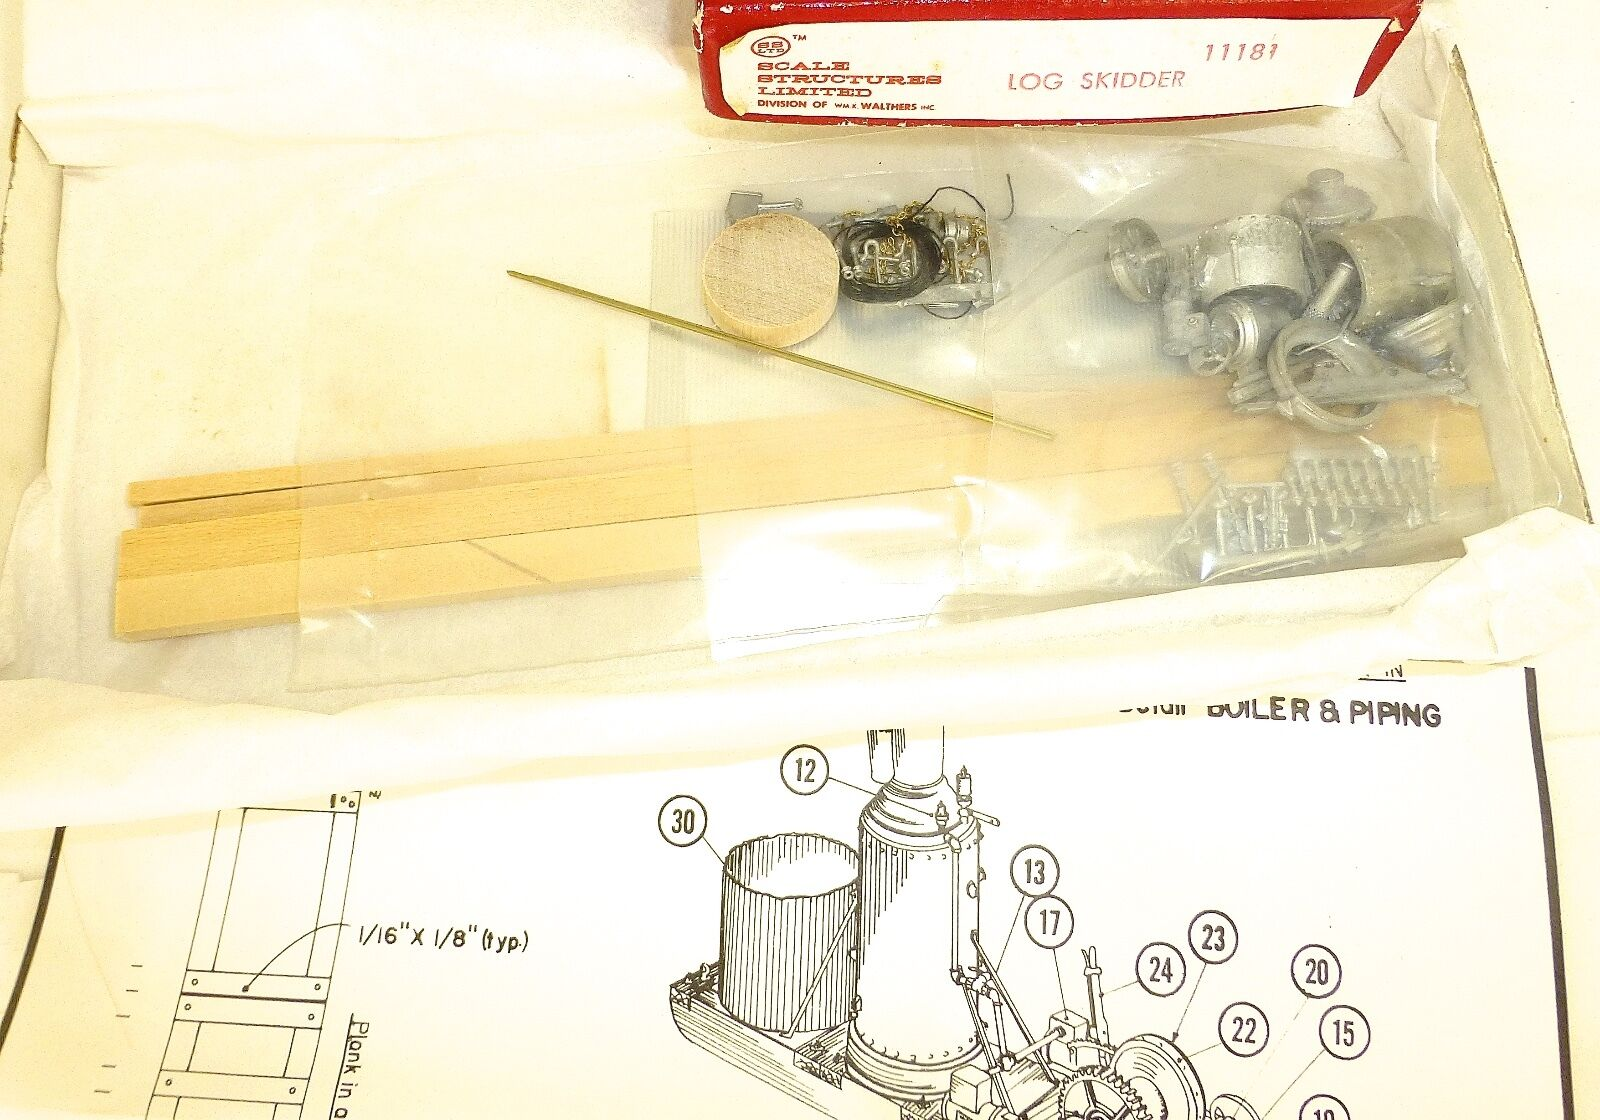 Log Skidder Kit Kit ungebaut ungebaut ungebaut SCALE STRUCTURES Limited 11181 h0 1:87 Neuf dans sa boîte å | New Style,En Ligne  | Terrific Value  | Durable  9d993f